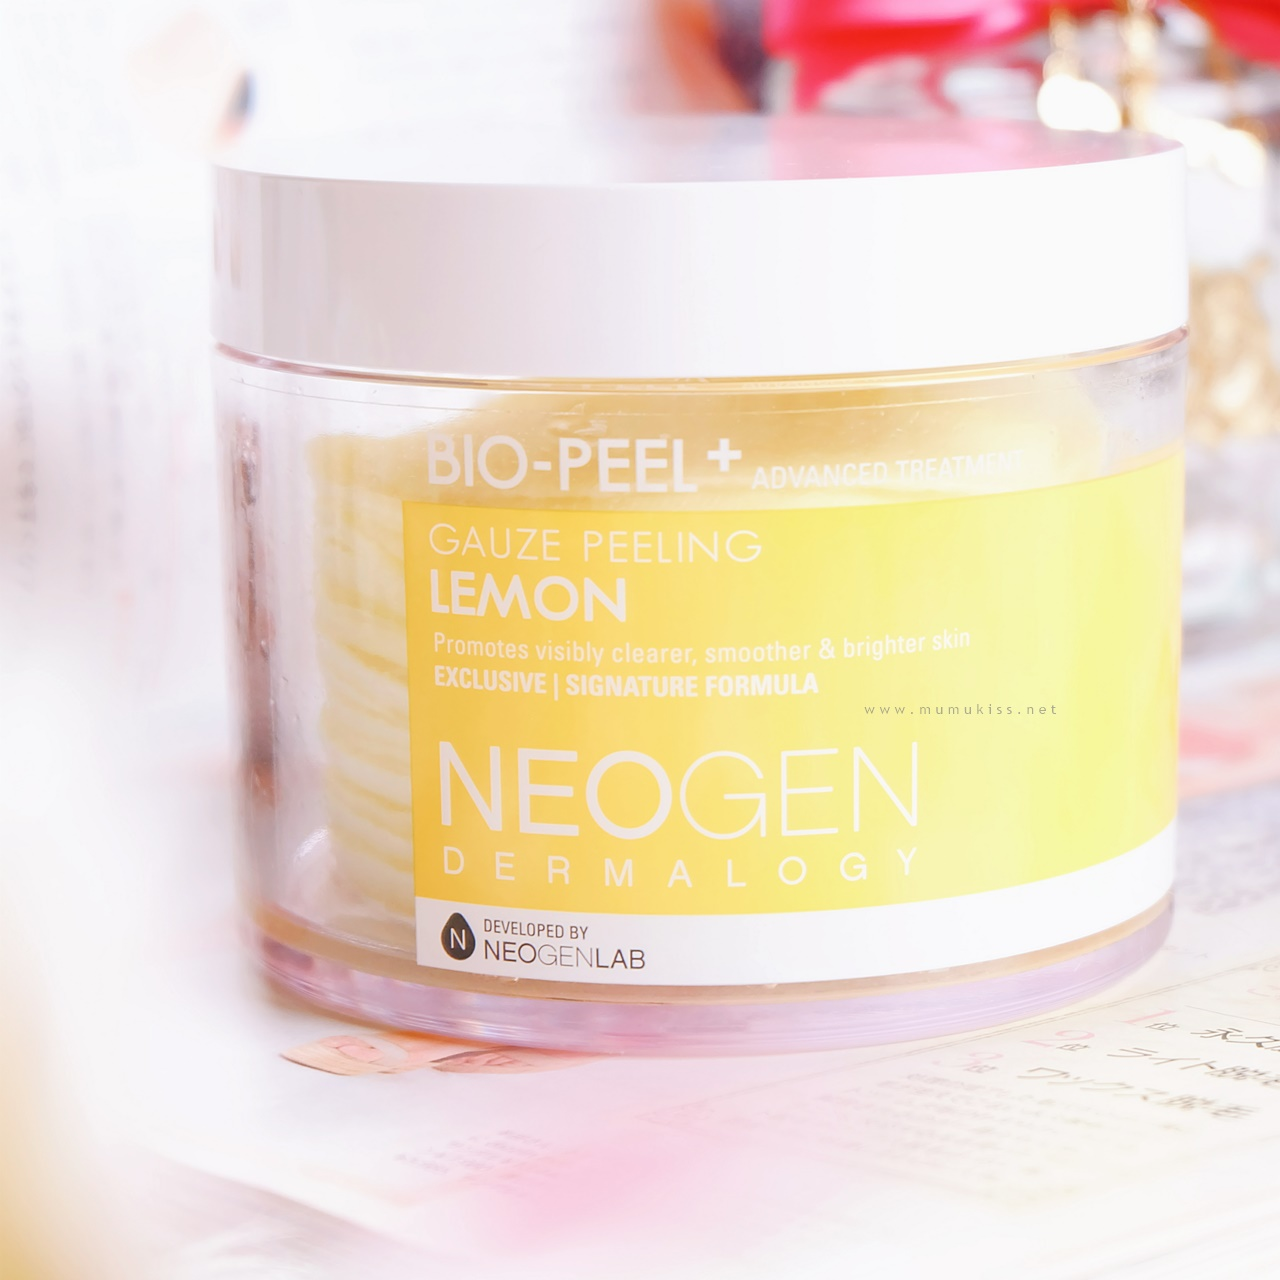 Review: Neogen Bio-Peel Gauze Peeling Lemon [SPONSORED